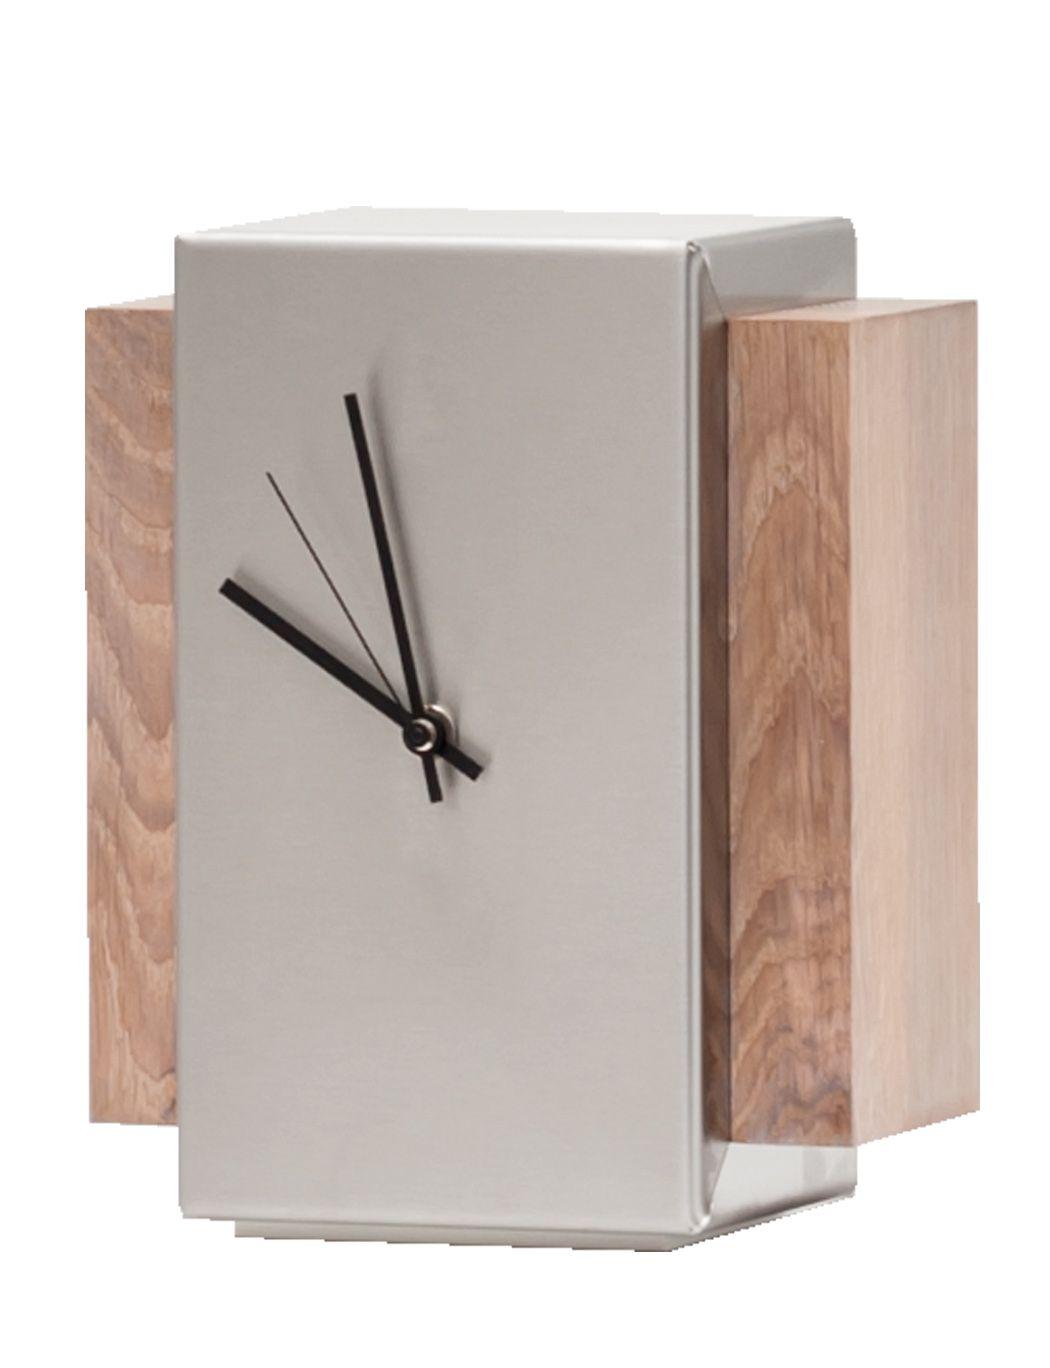 Designer tischuhr hannover edelstahl mit eiche whitewash for Designermobel hannover